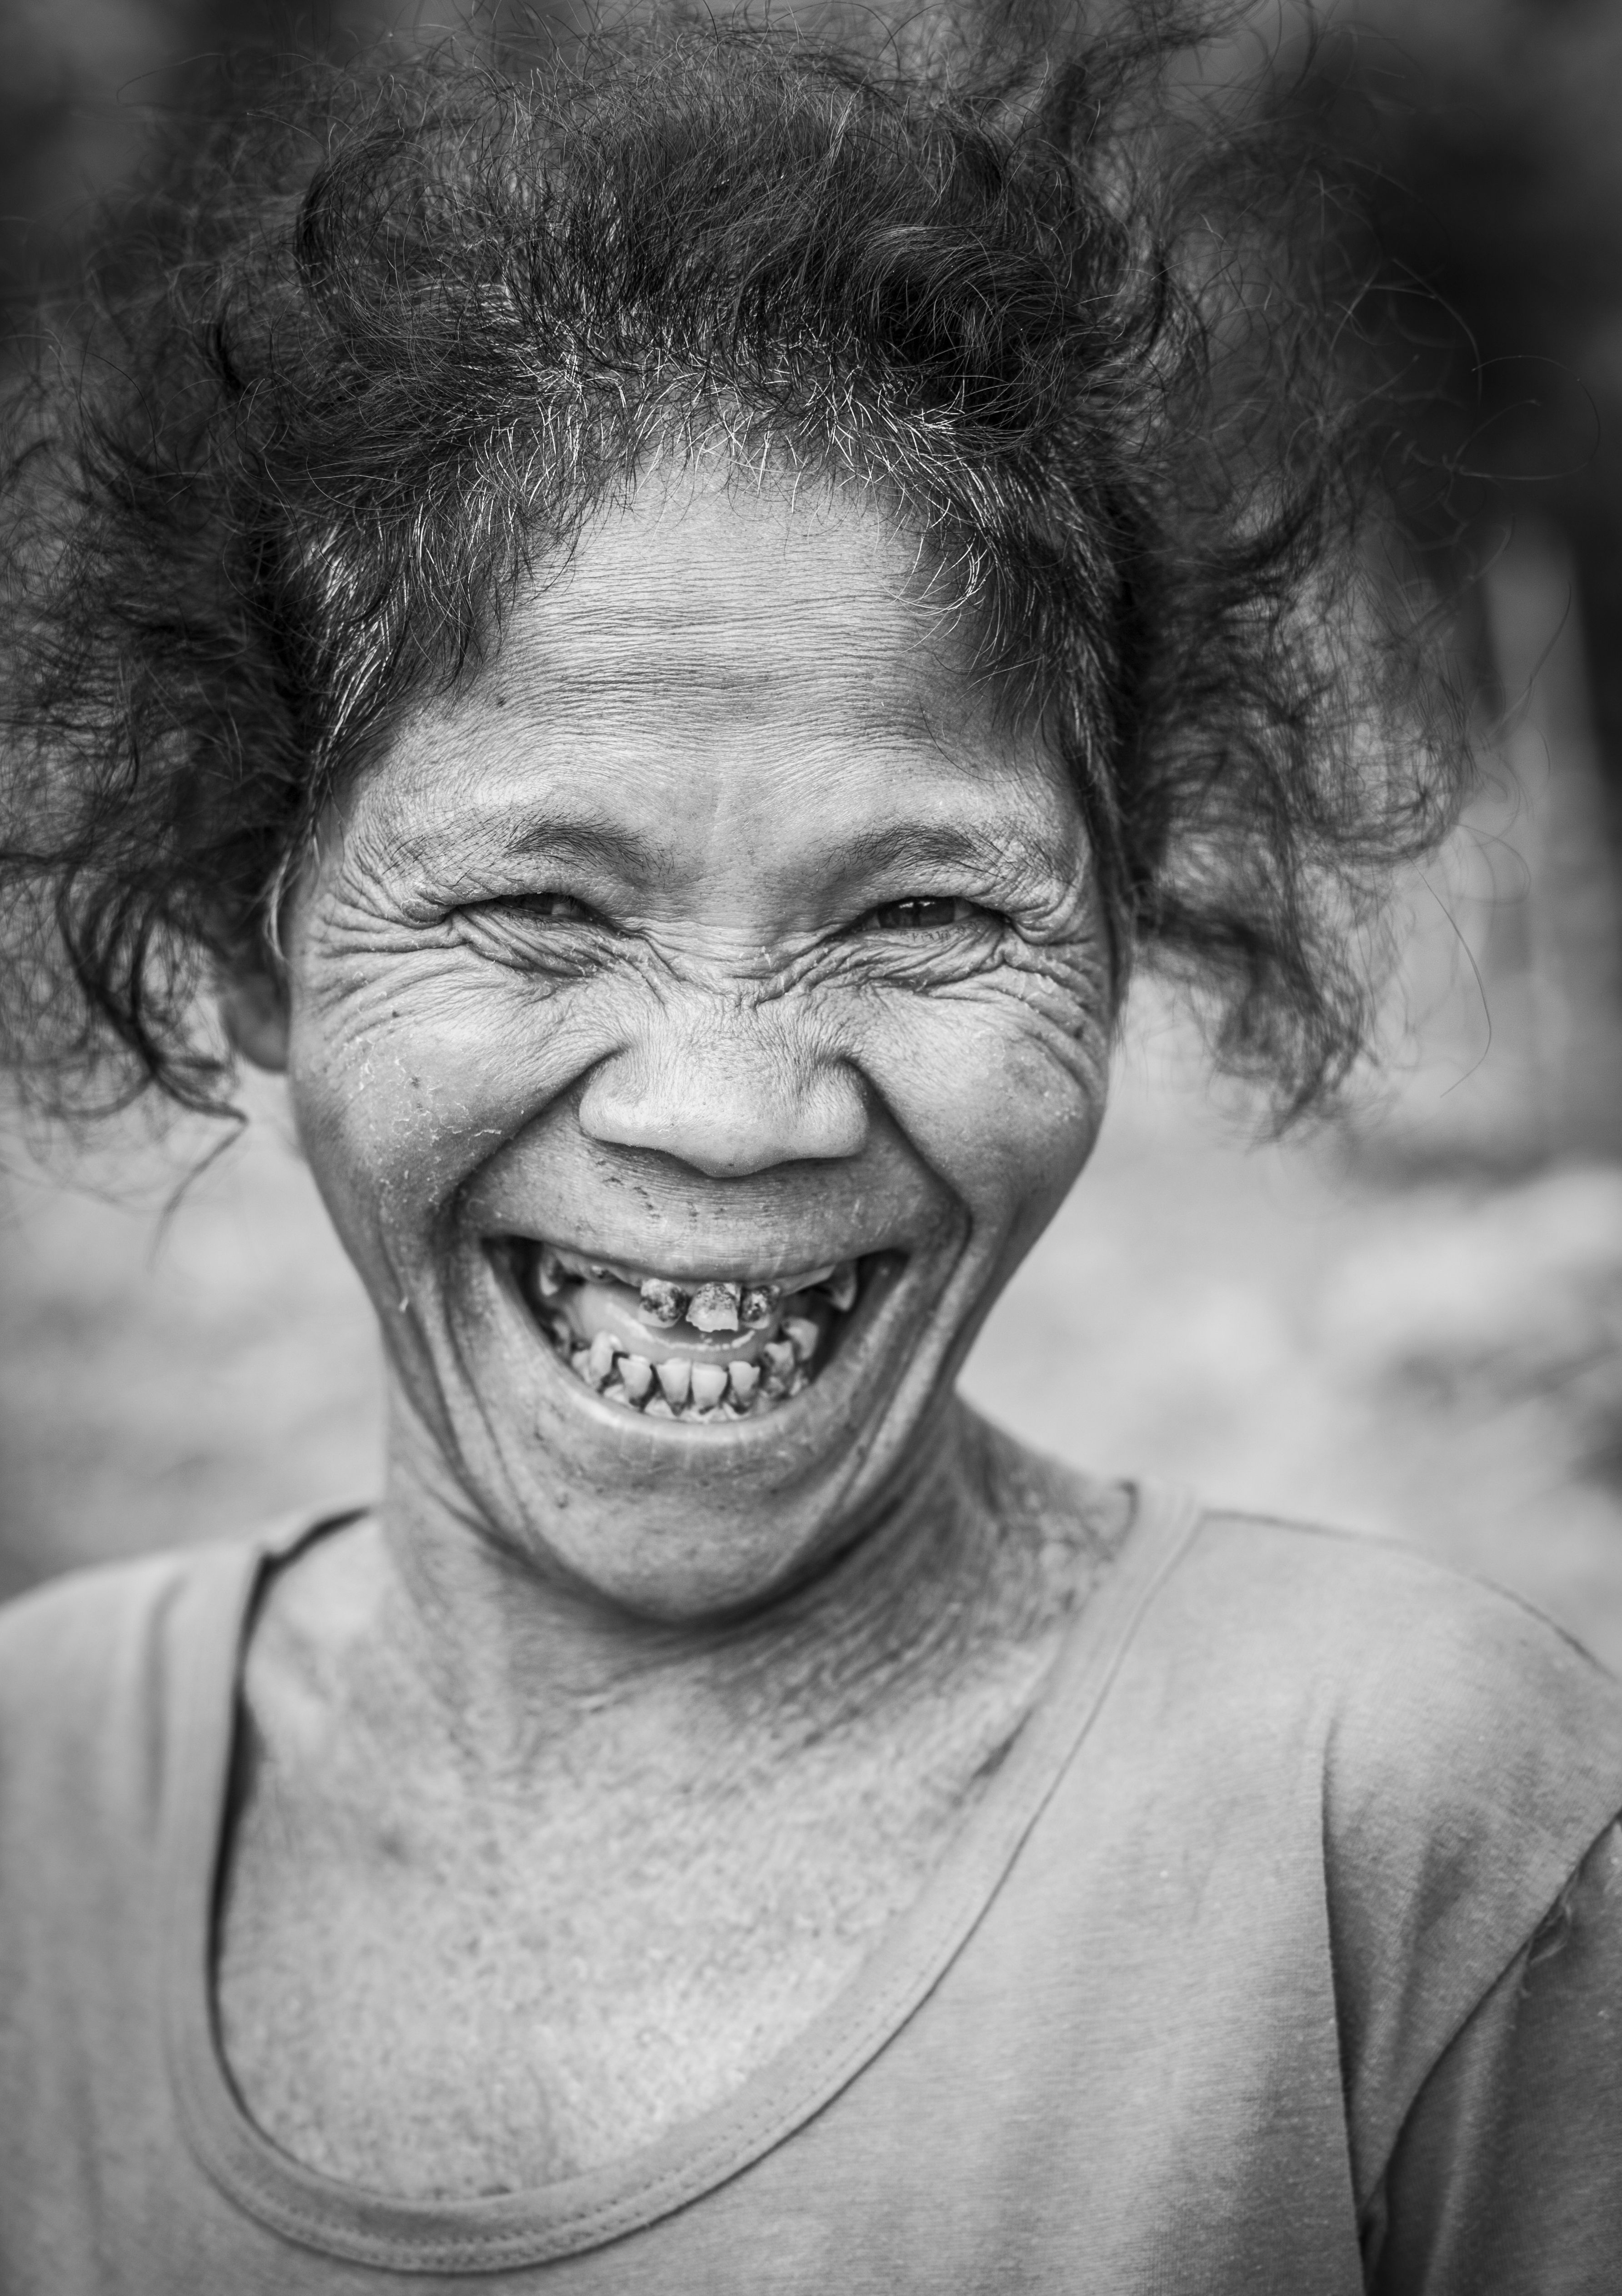 smile#aeta# | portrait art | Pinterest | Portraits